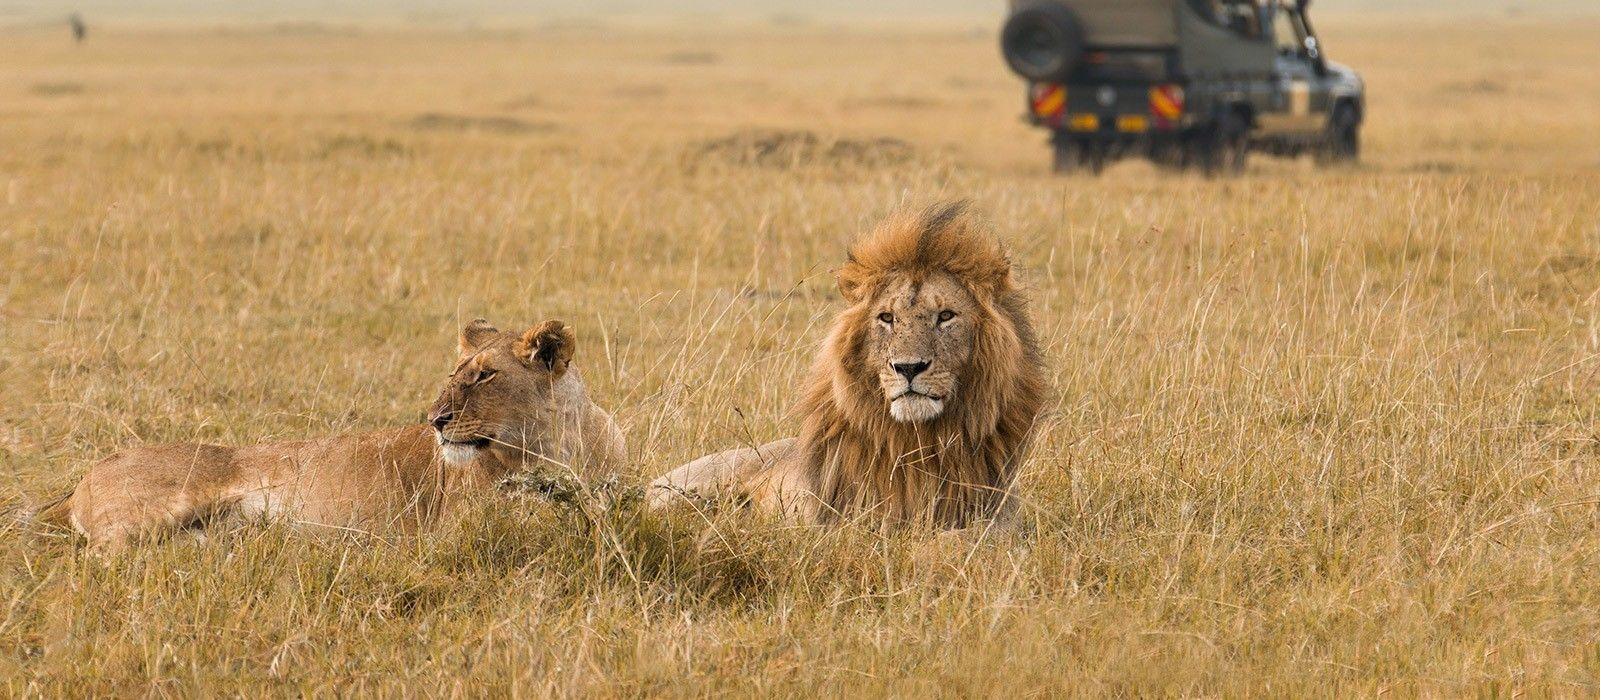 Kenya Safari and Zanzibar Tour Trip 4